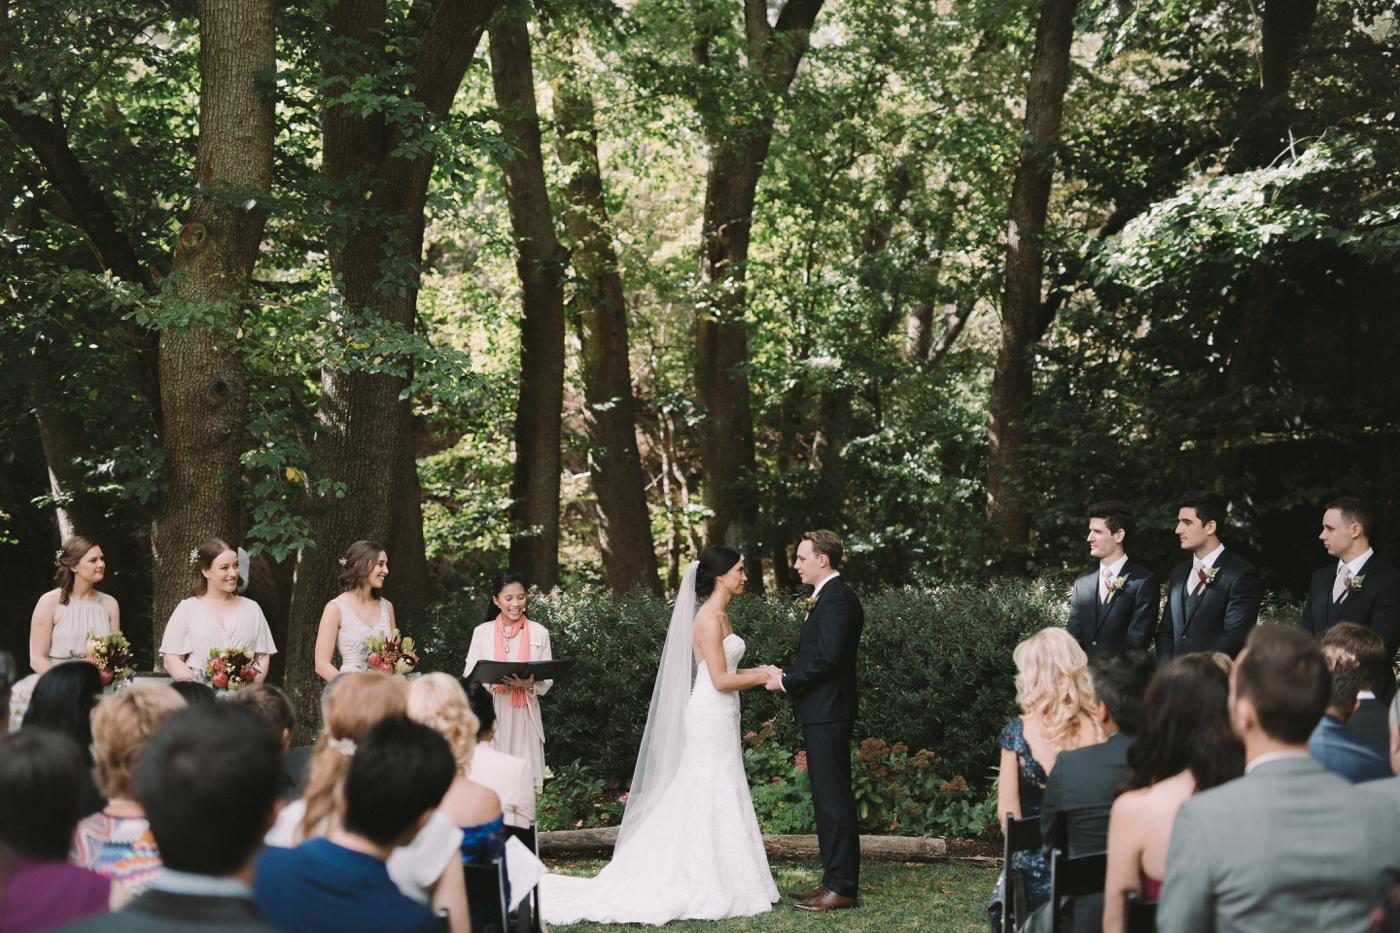 Jasmine and Adam - Natural wedding photographer in Adelaide - Candid Wedding Photographer Adelaide - www.katherineschultzphotography.com 17